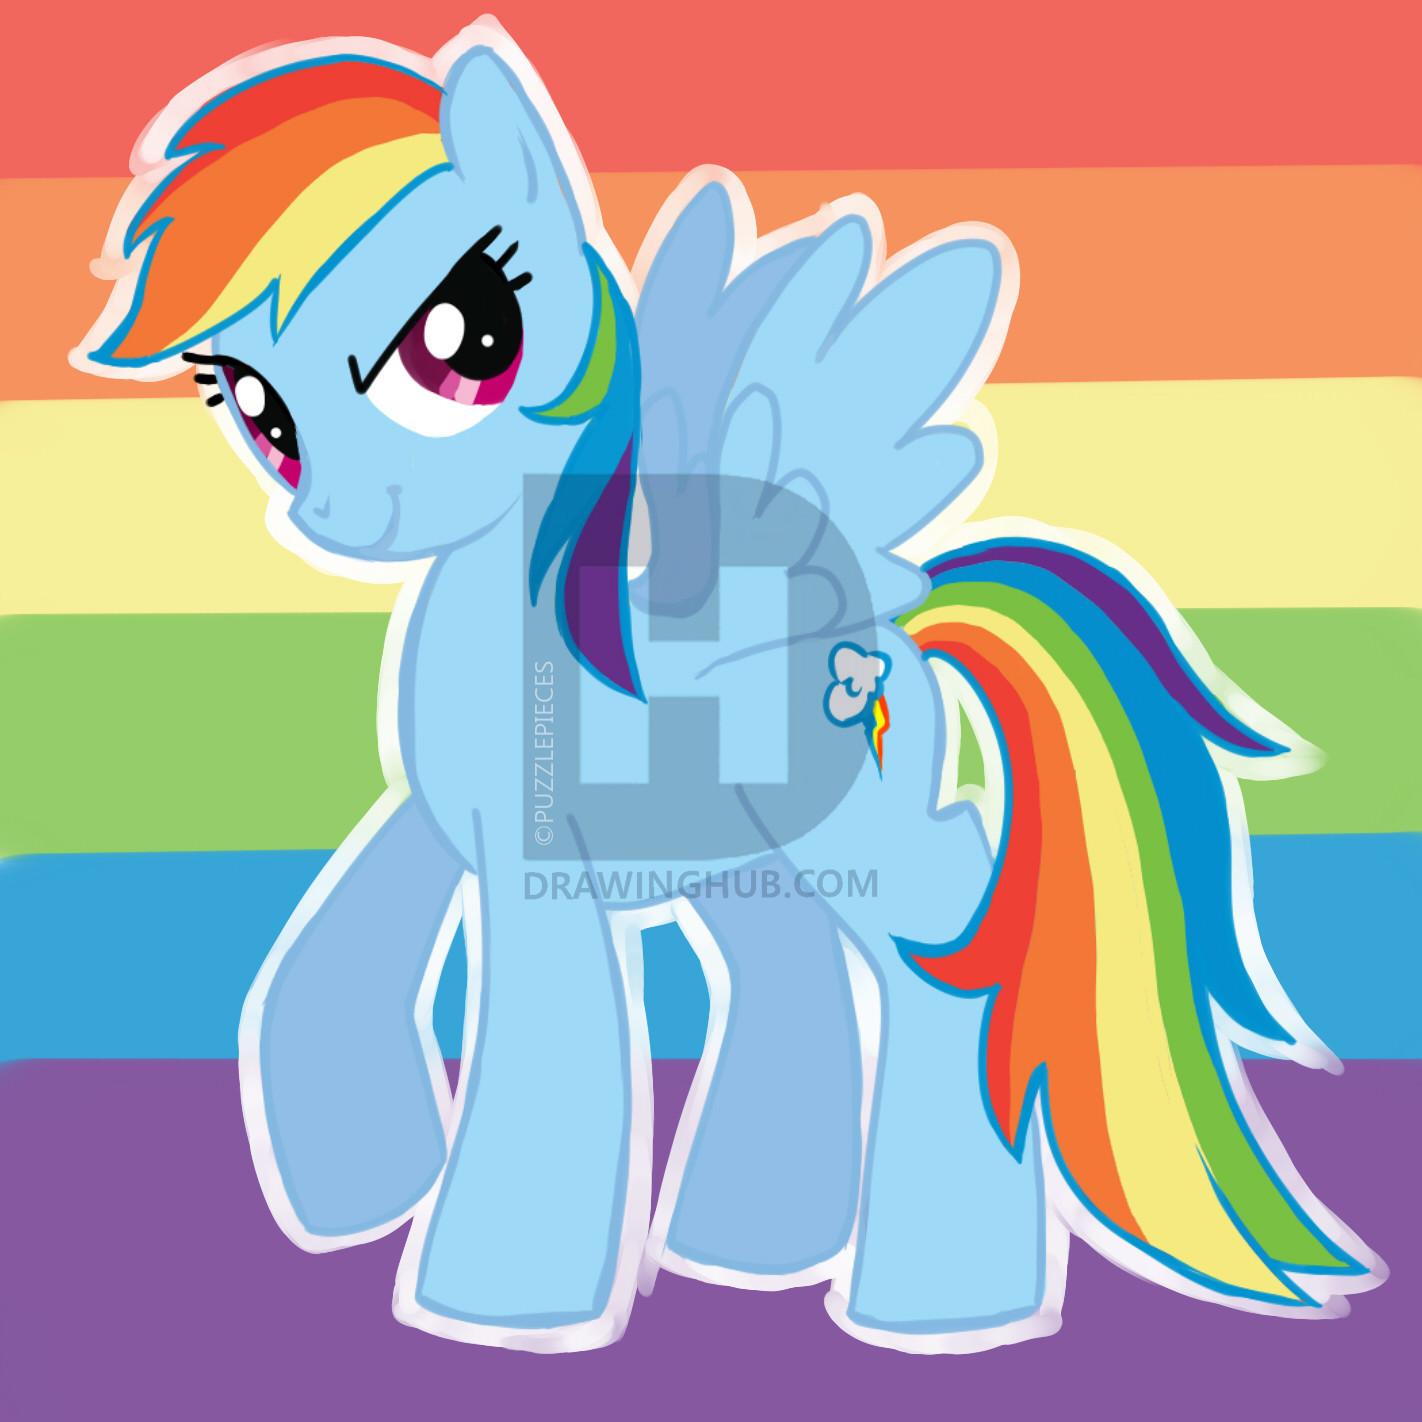 1422x1422 How To Draw Rainbow Dash, My Little Pony Friendship Is Magic, Step